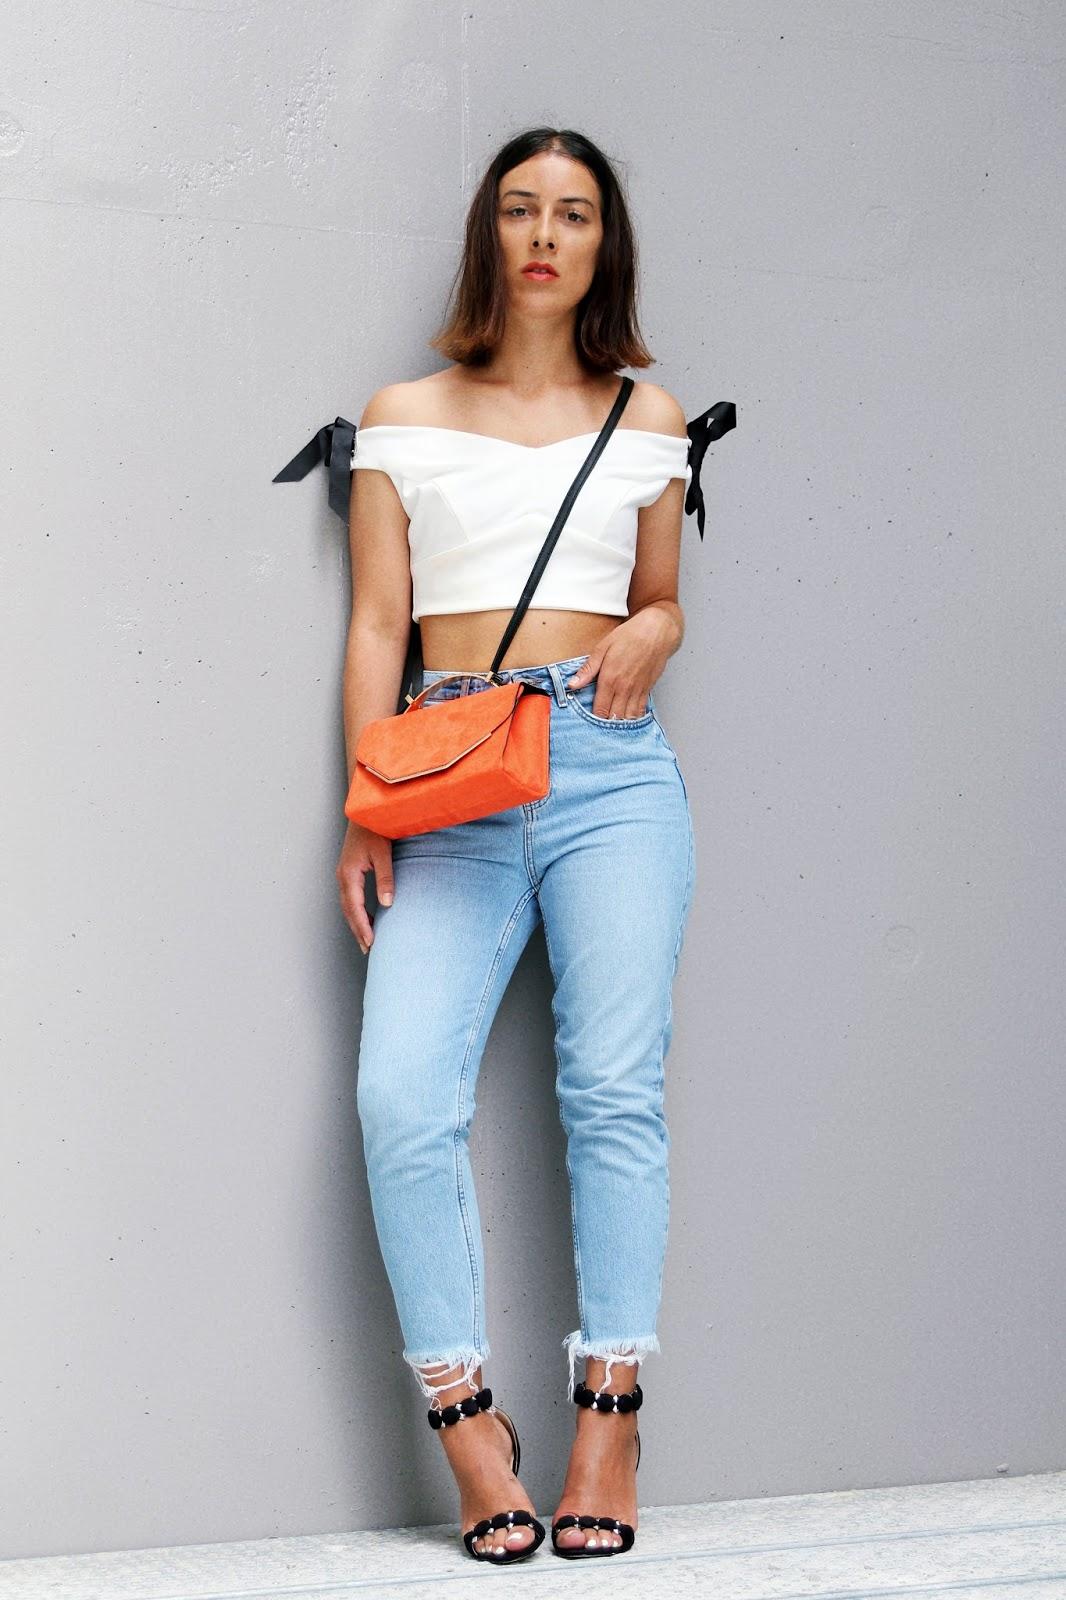 idée-de-look-été-2017-crop-top-jean-taille-haute-summer